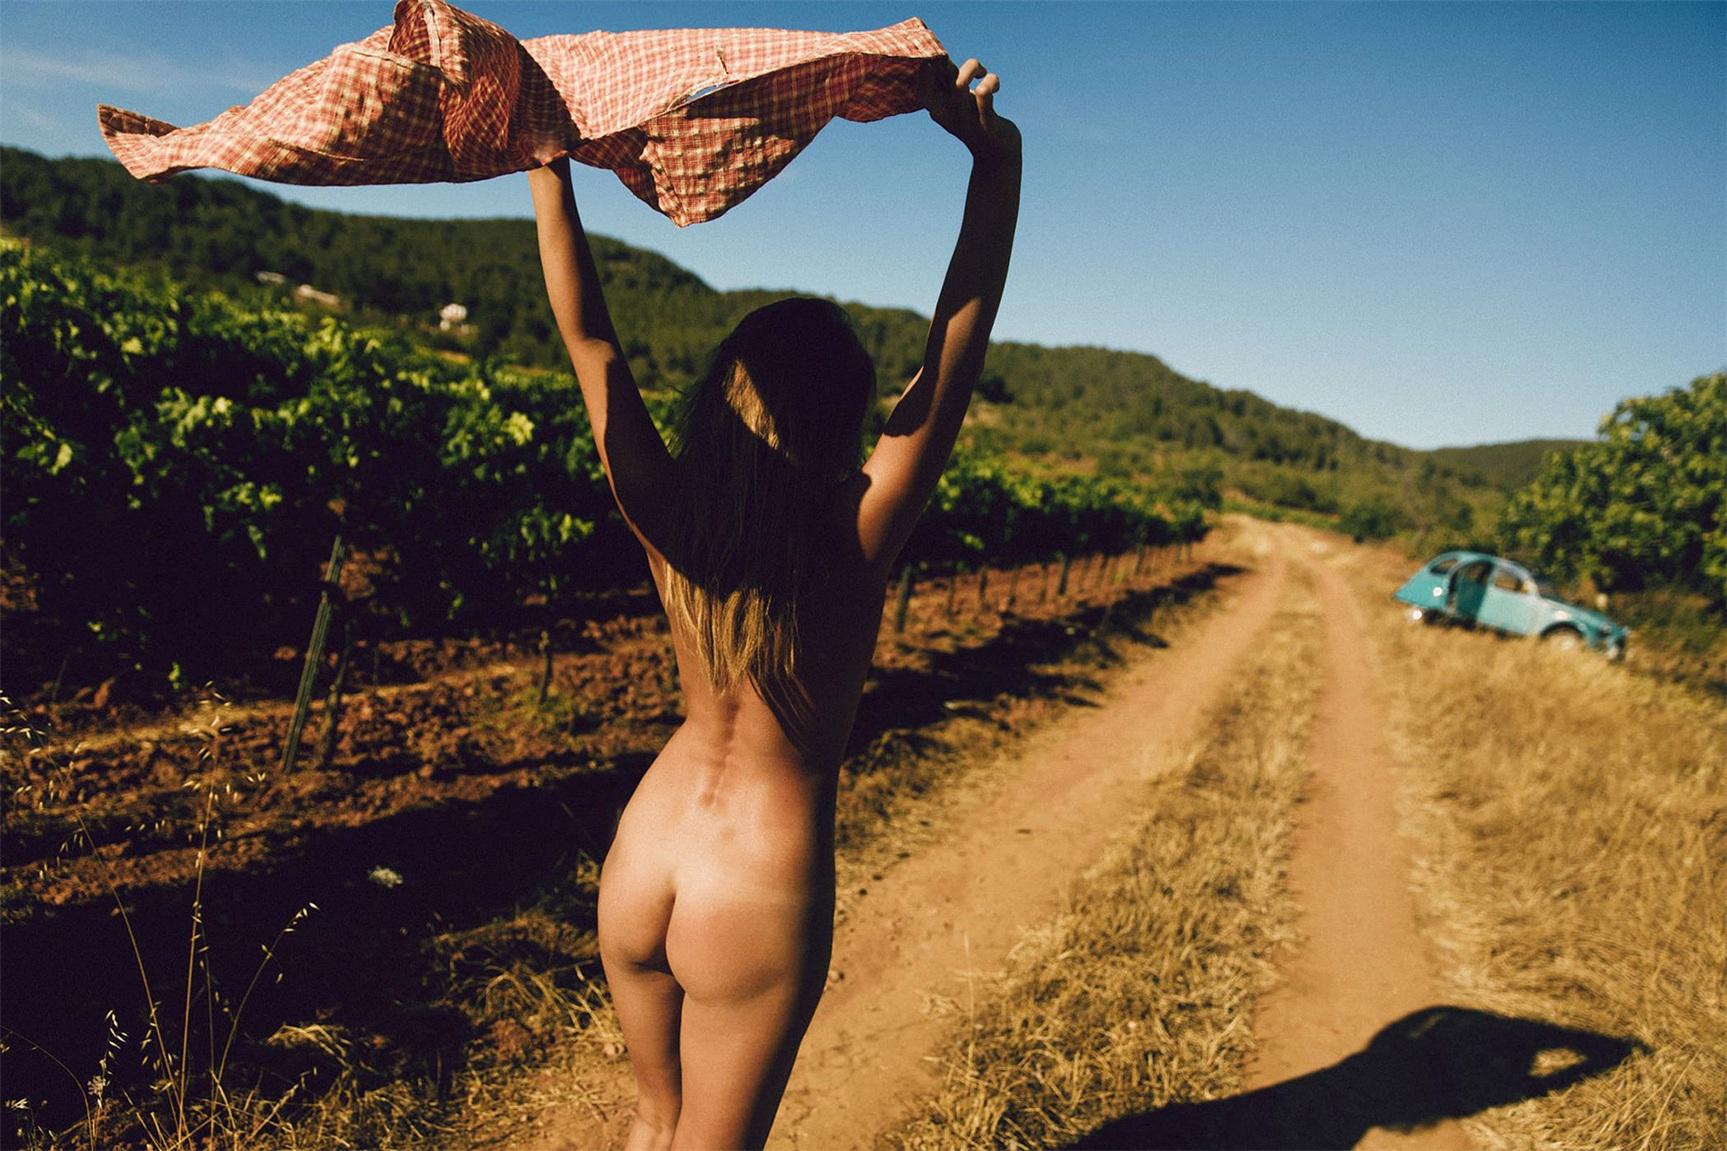 на природе с Марисой Папен / Marisa Papen nude by Jörg Billwitz - French Picnic